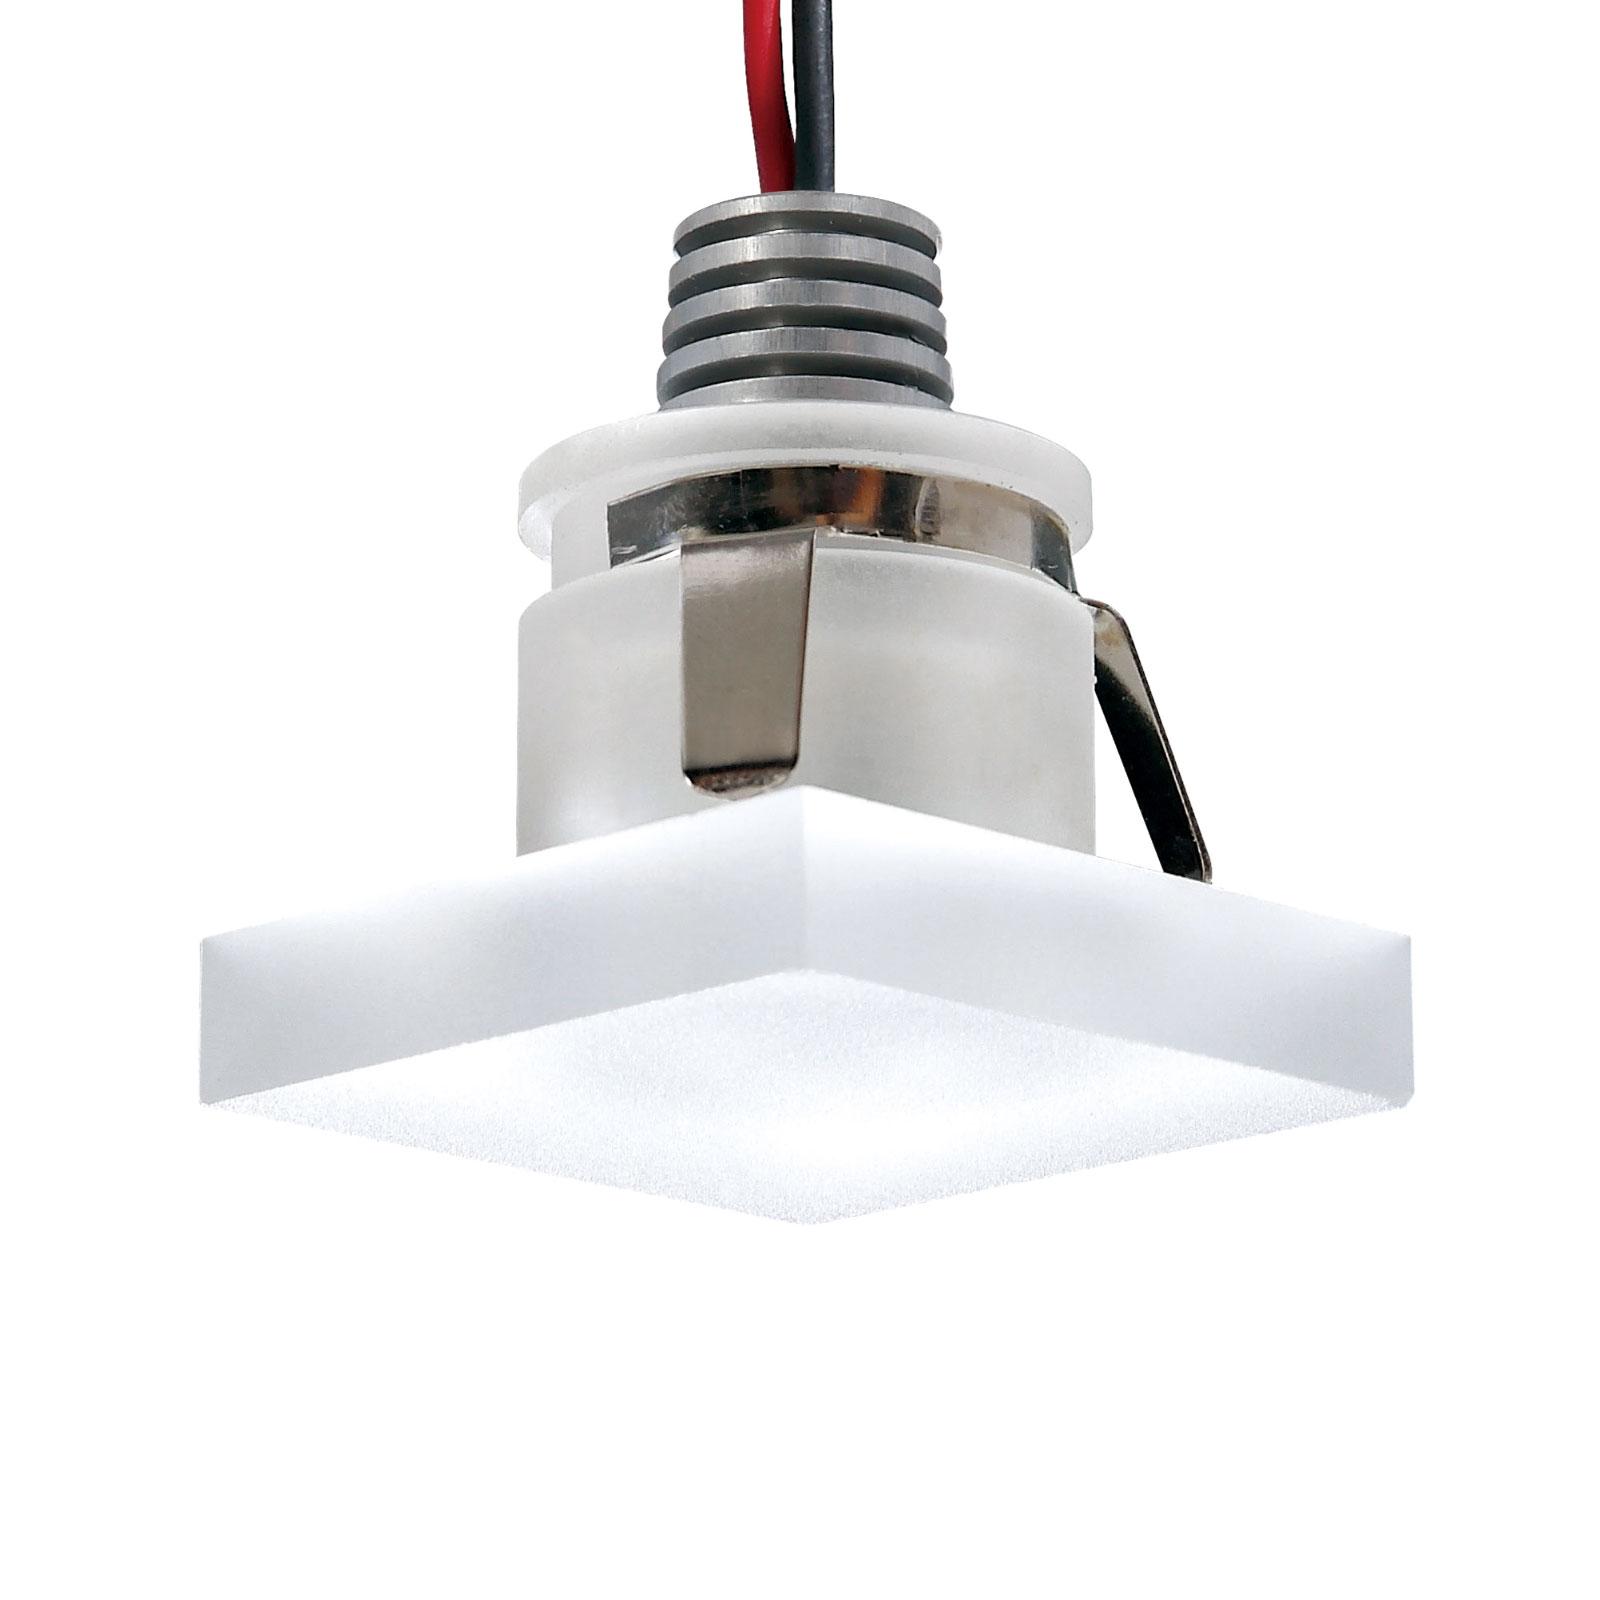 Spot LED incasso Cristalin, angolare, IP44